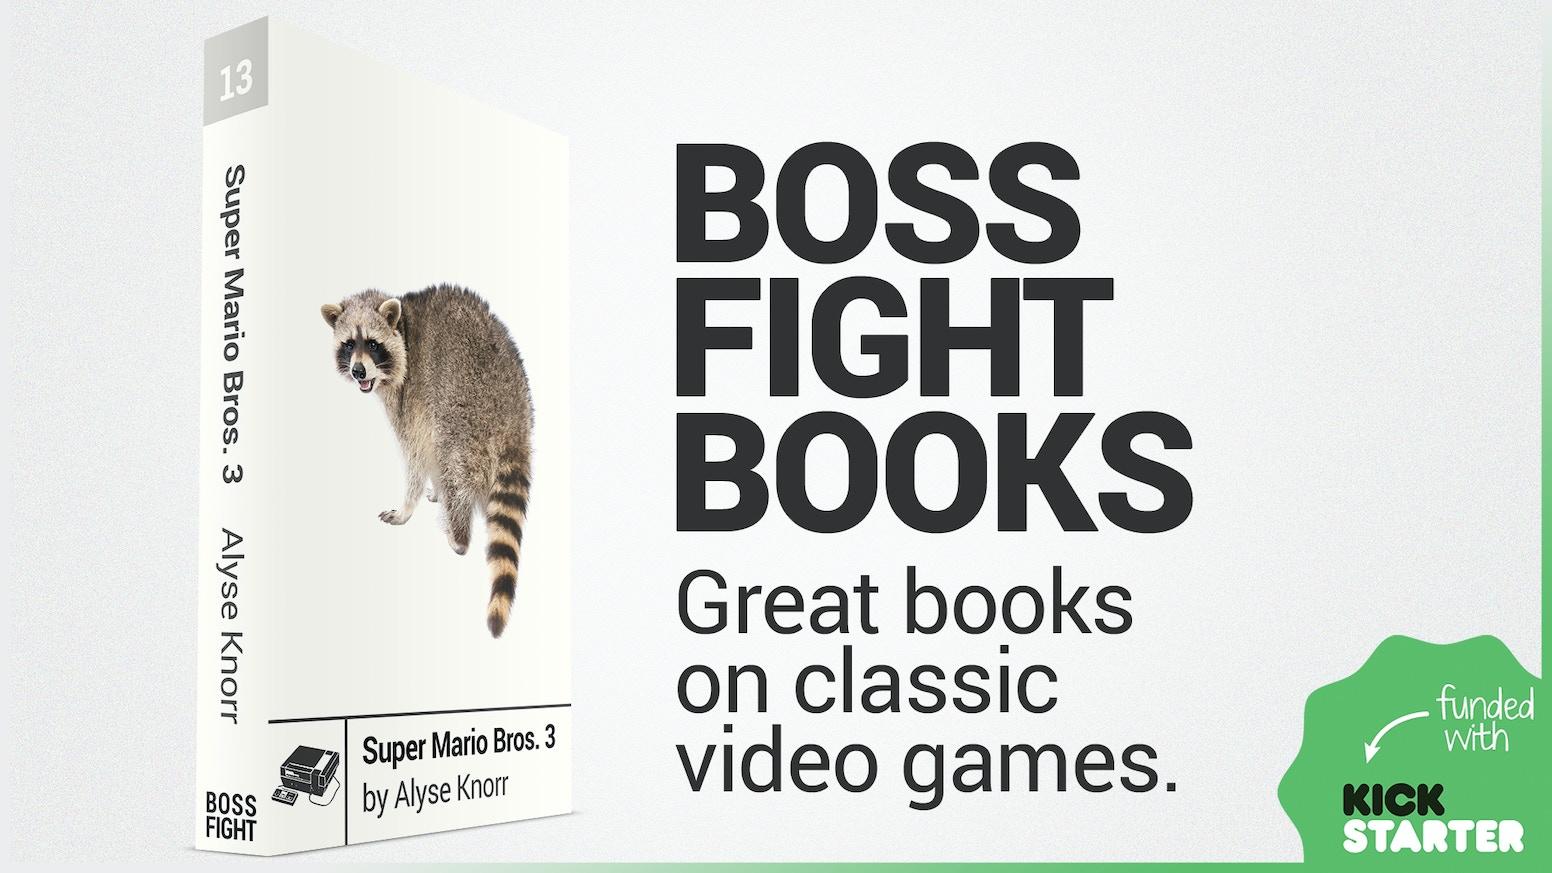 Great books on classic video games. Super Mario Bros. 3, Katamari Damacy, Soft & Cuddly, Mega Man 3, and Kingdom Hearts II.